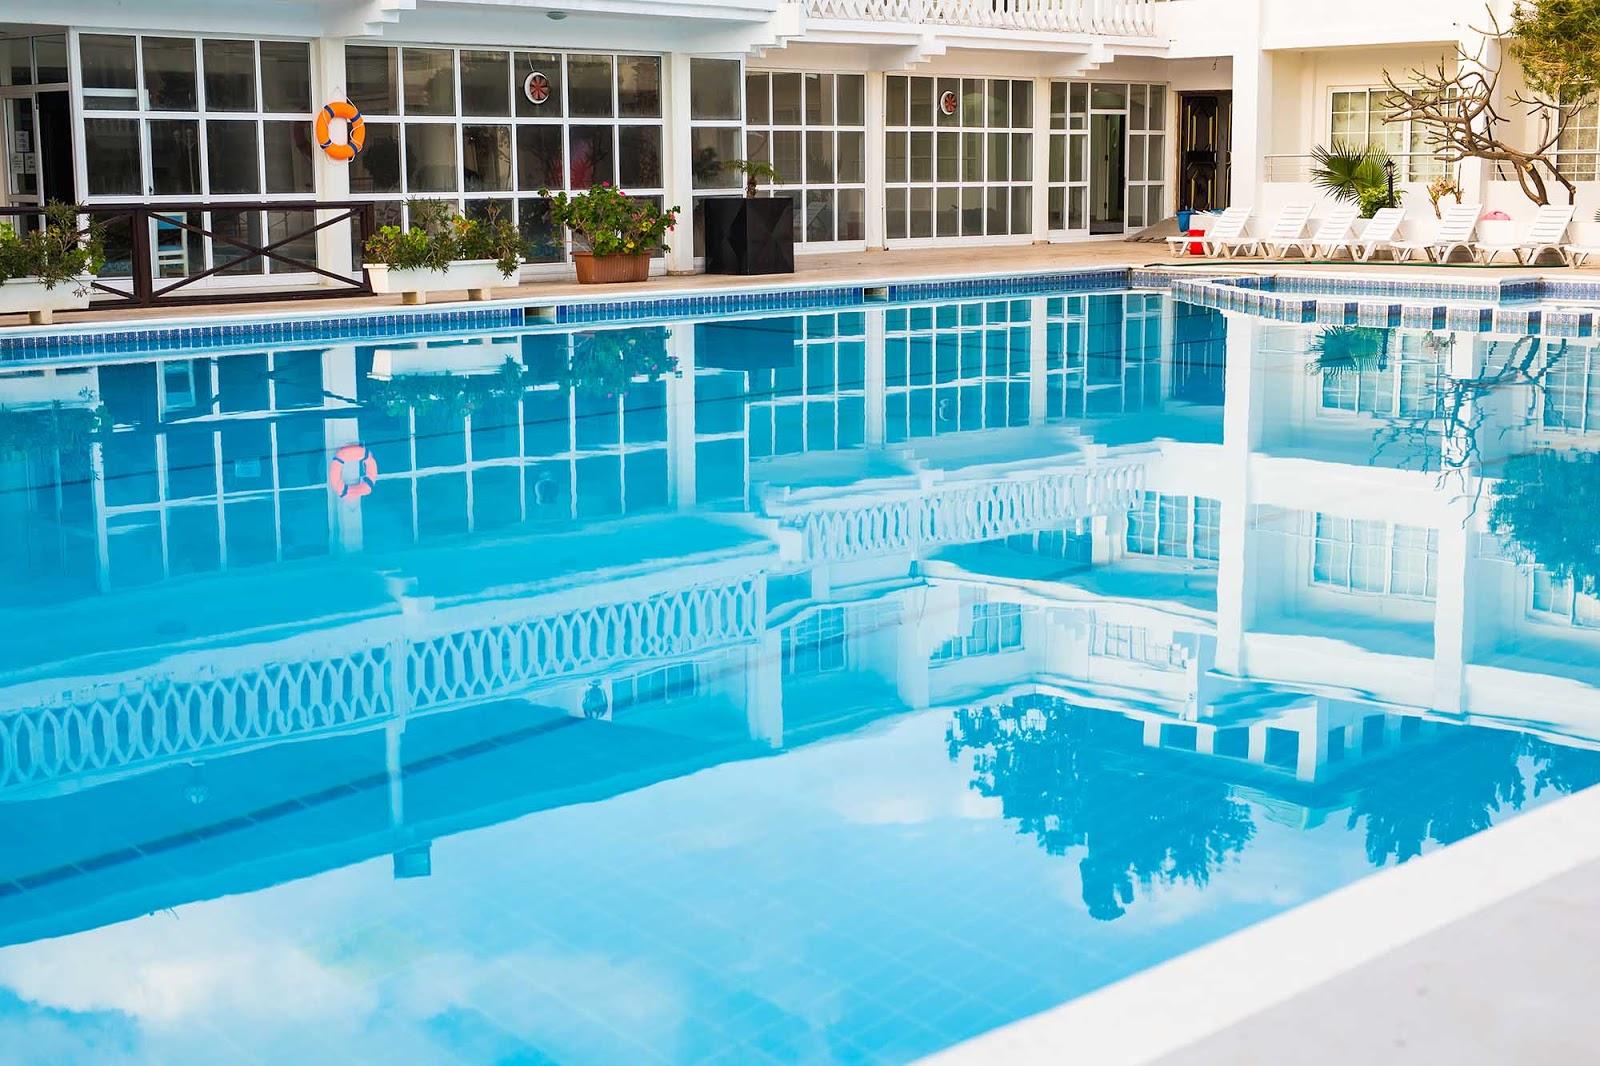 Hospitality Marketing & Digital Agency - Leading Hotel Marketing